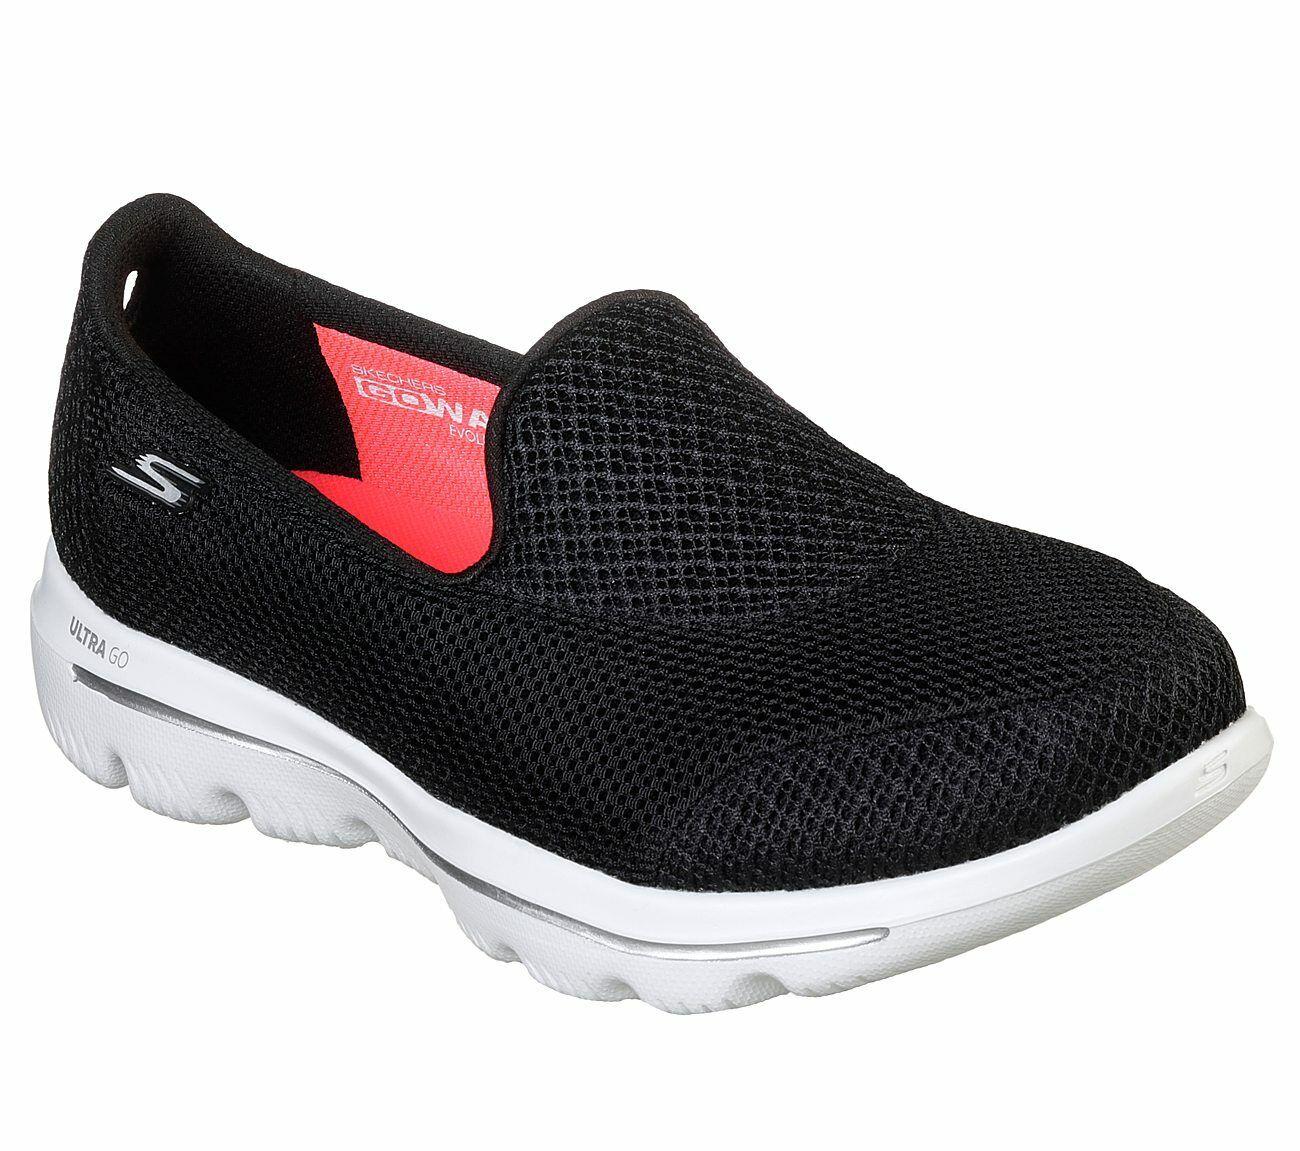 Skechers GO WALK 2 Sneaker in schwarz Baby & Kind